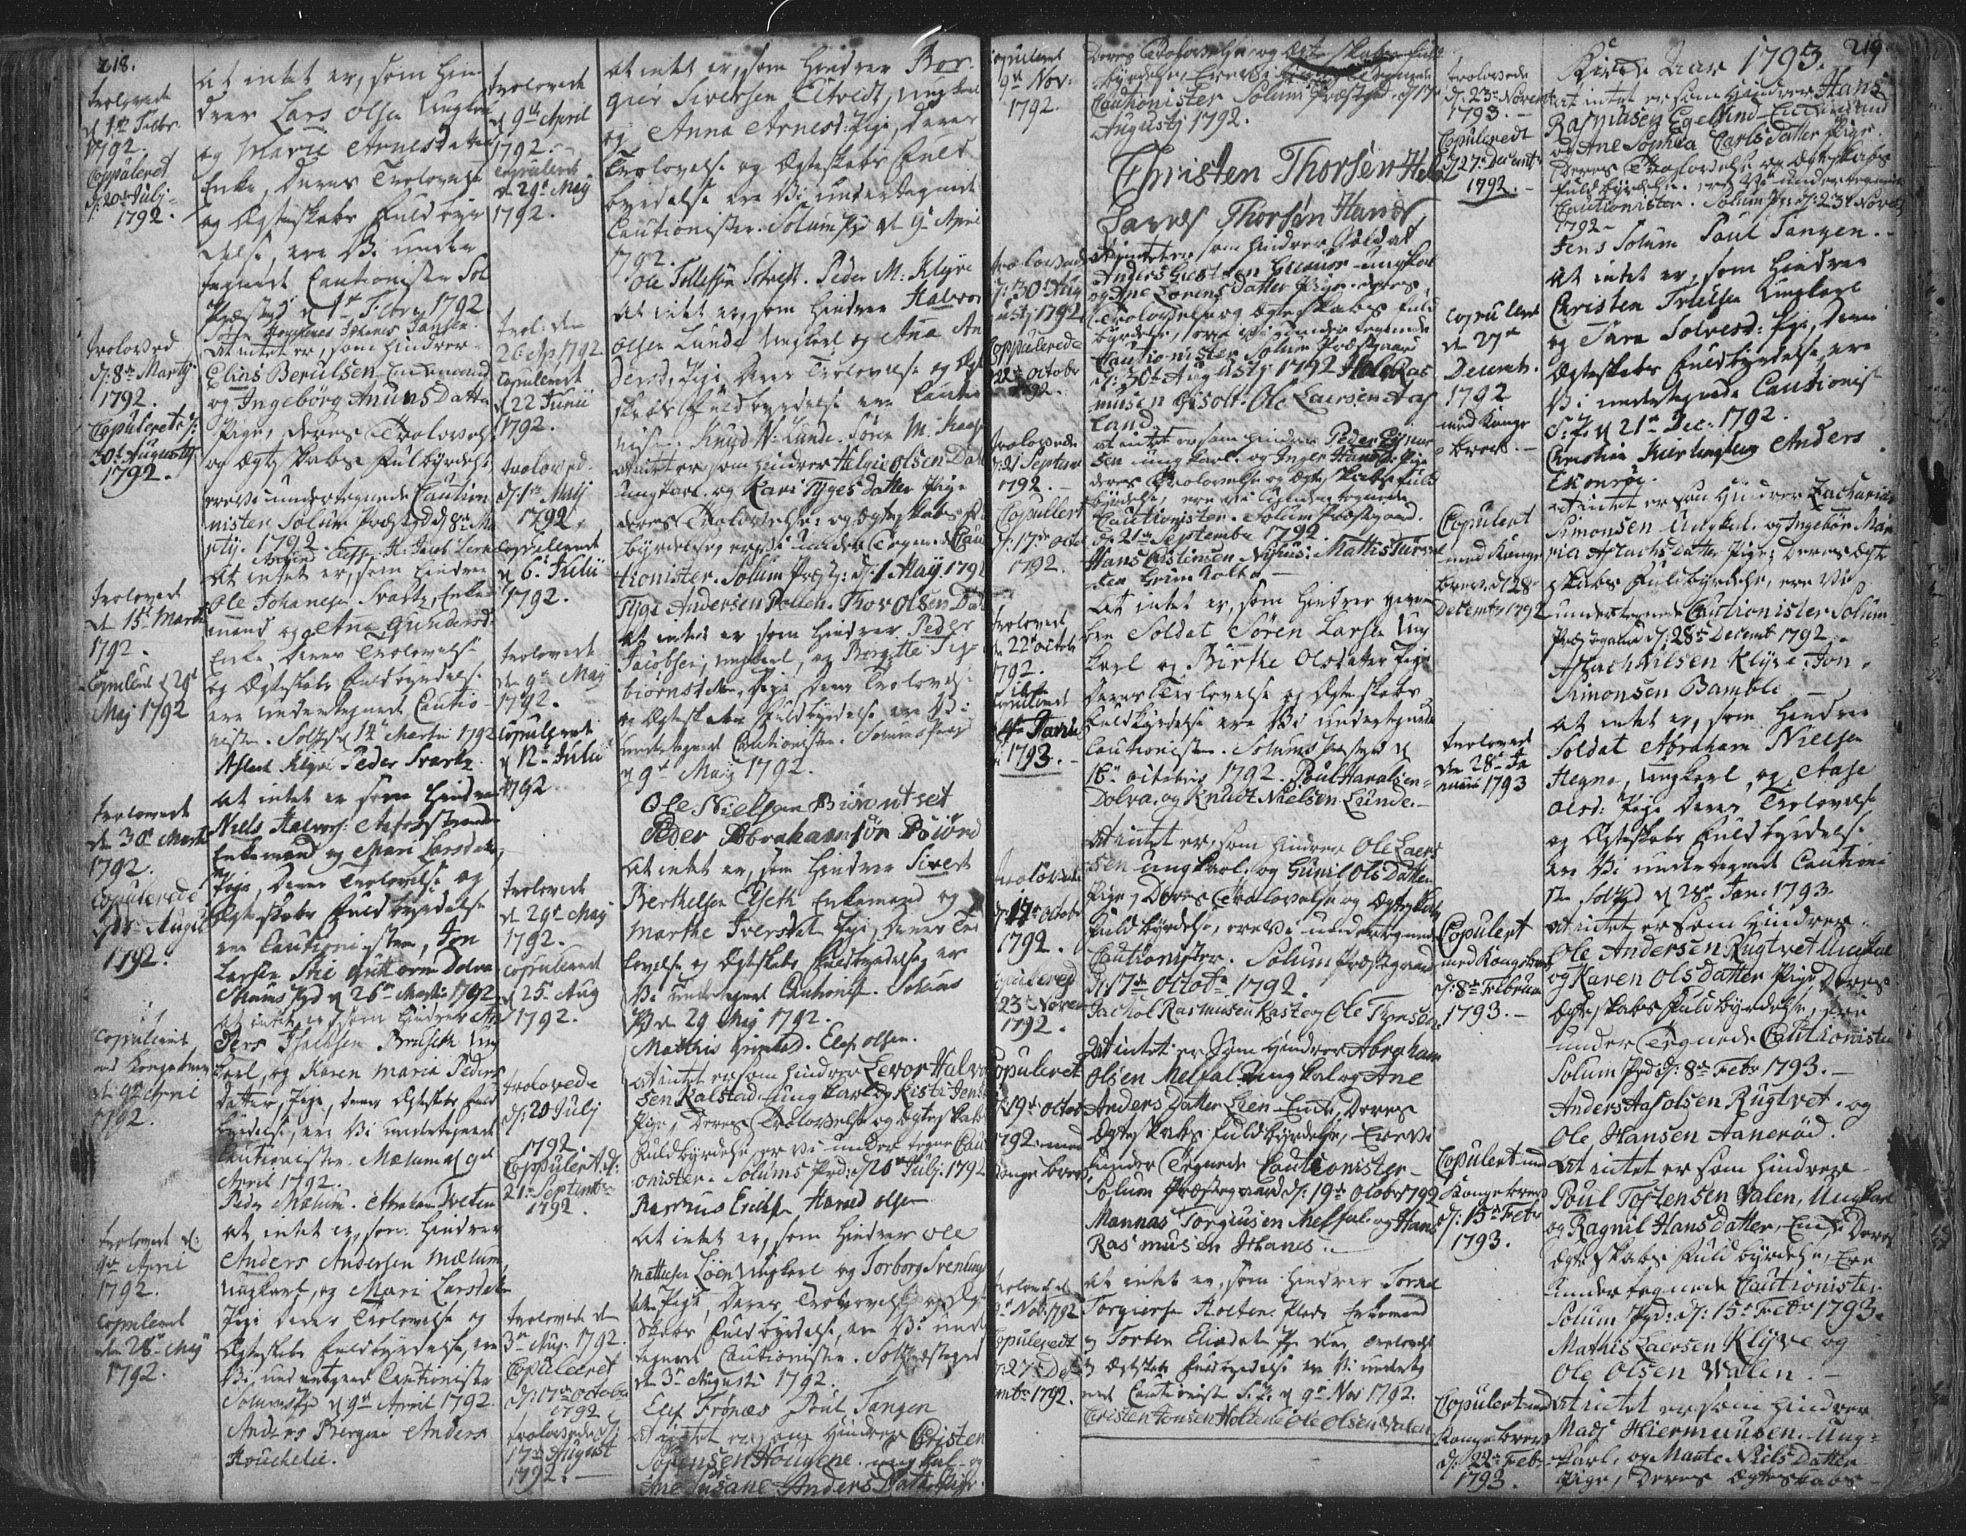 SAKO, Solum kirkebøker, F/Fa/L0003: Ministerialbok nr. I 3, 1761-1814, s. 218-219